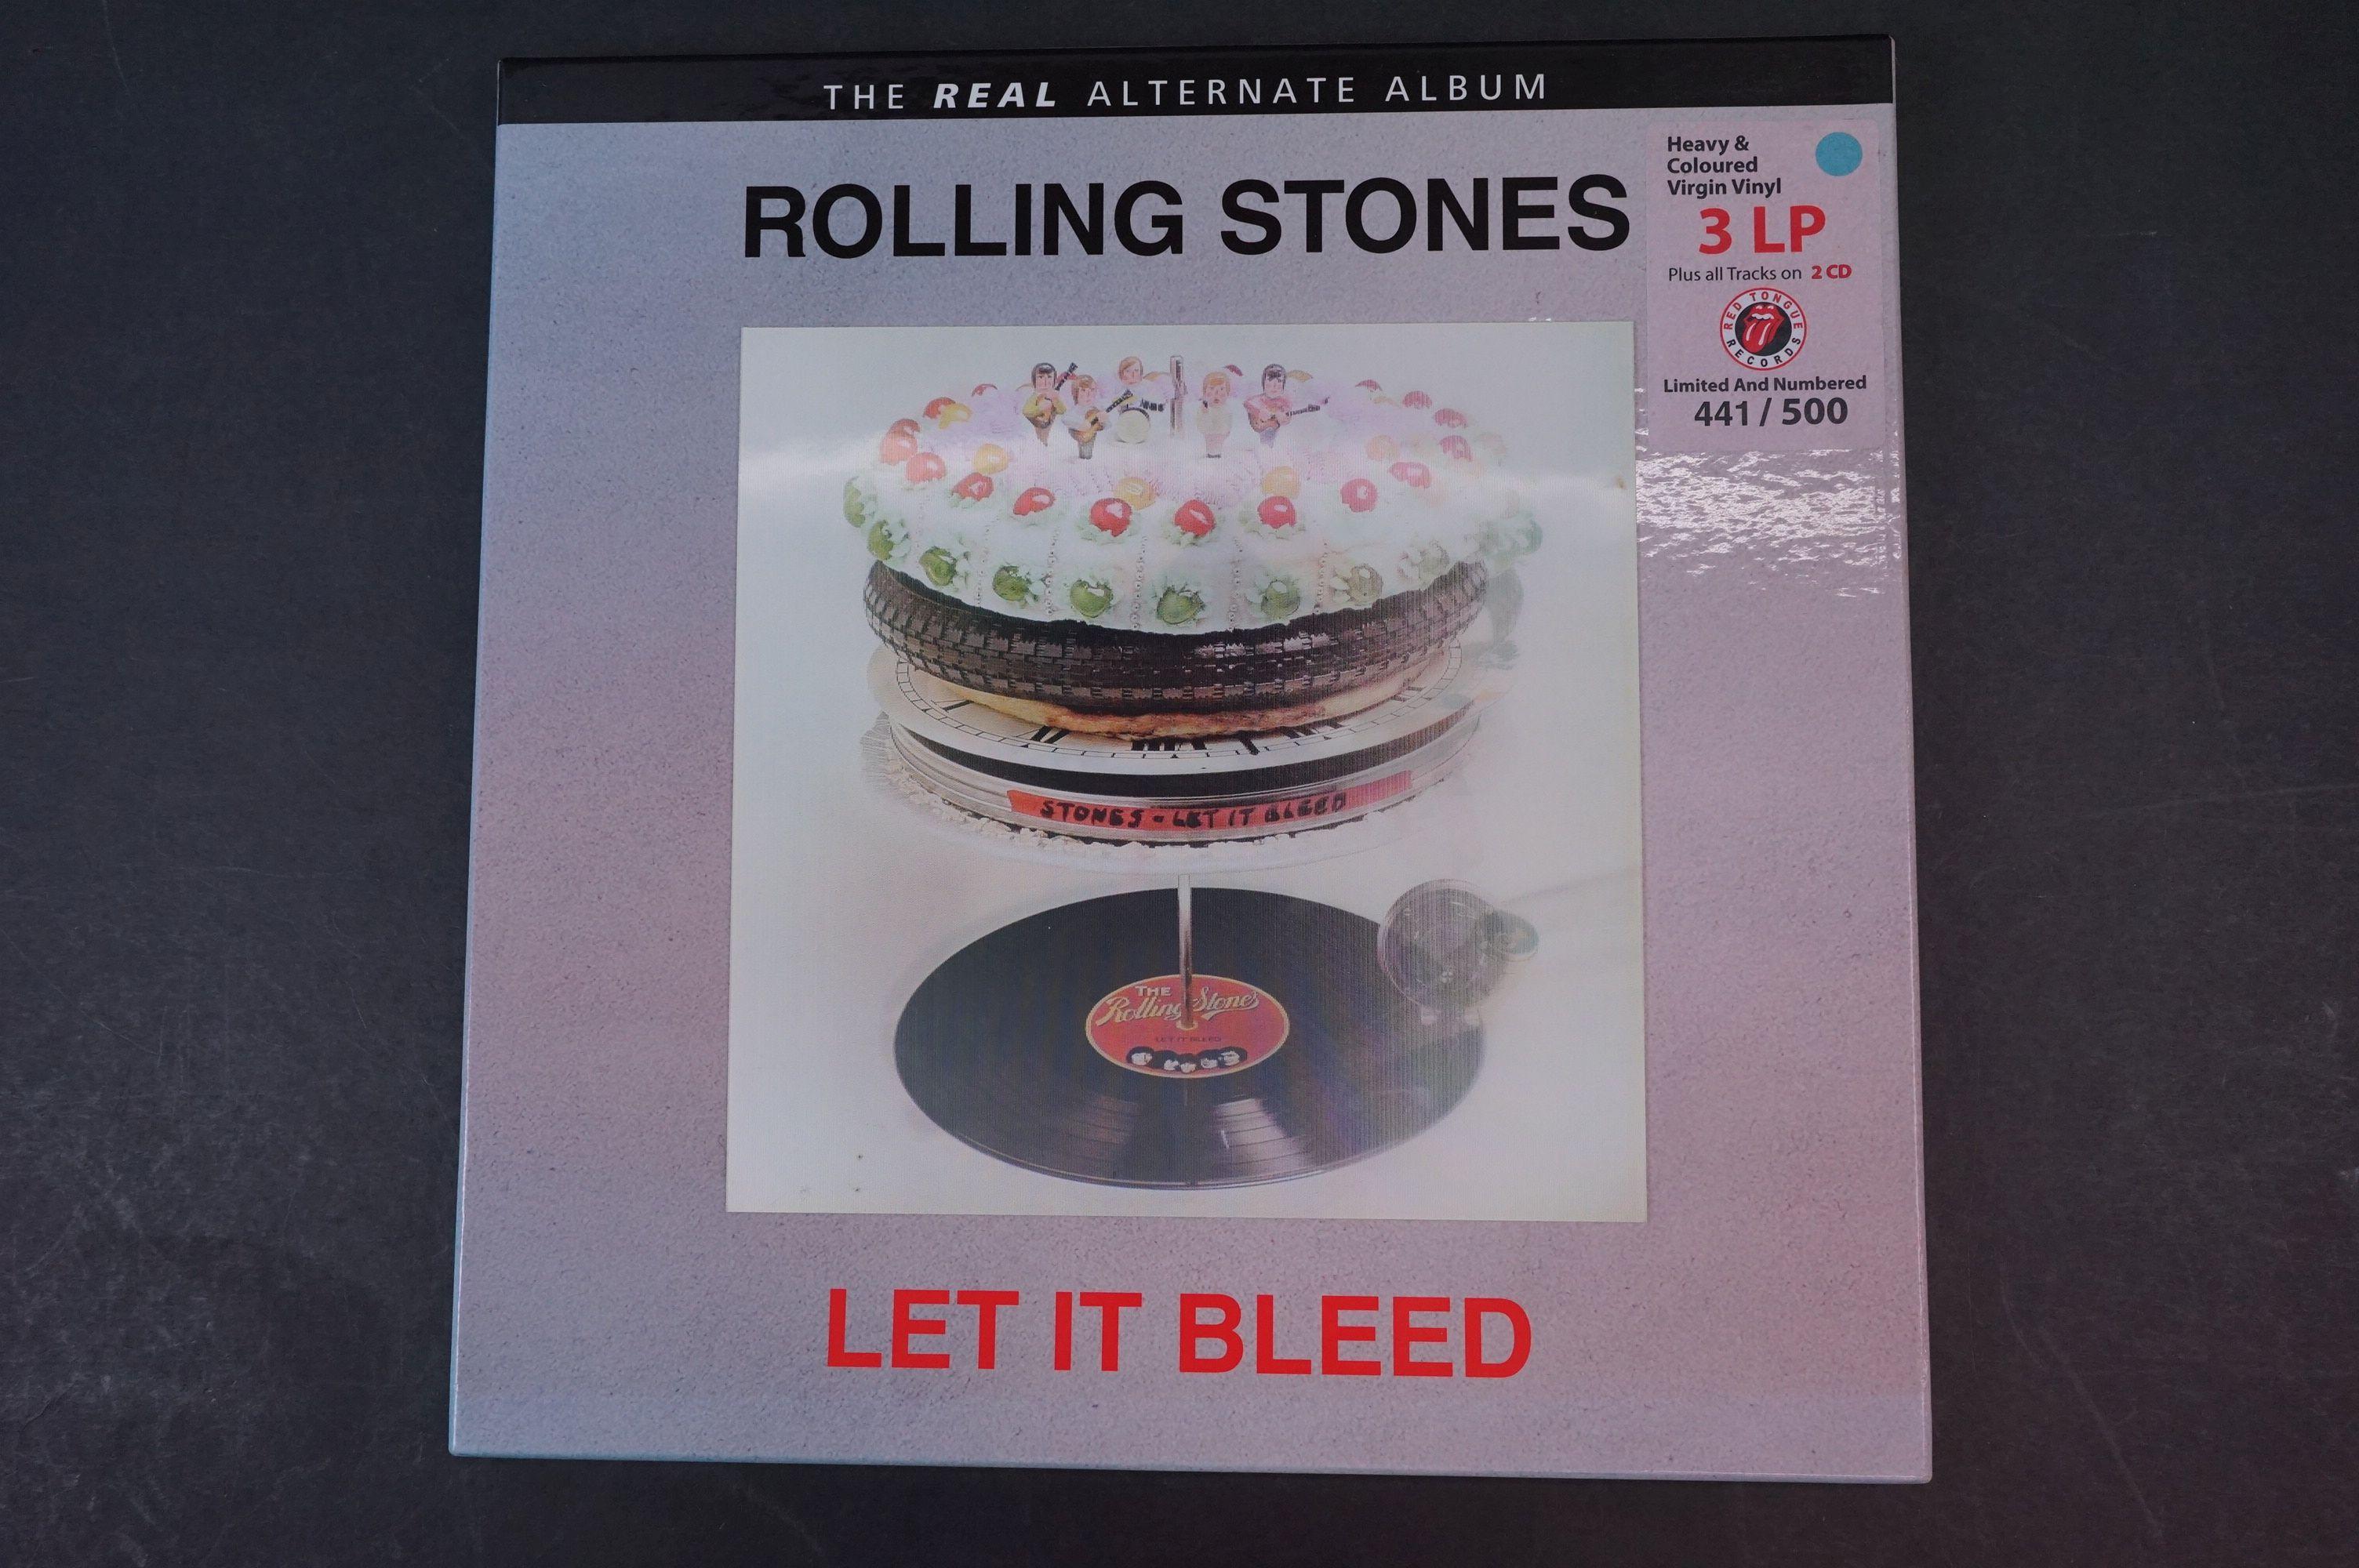 Vinyl - ltd edn The Real Alternate Album Rolling Stones Let It Bleed 3 LP / 2 CD Box Set RTR011,